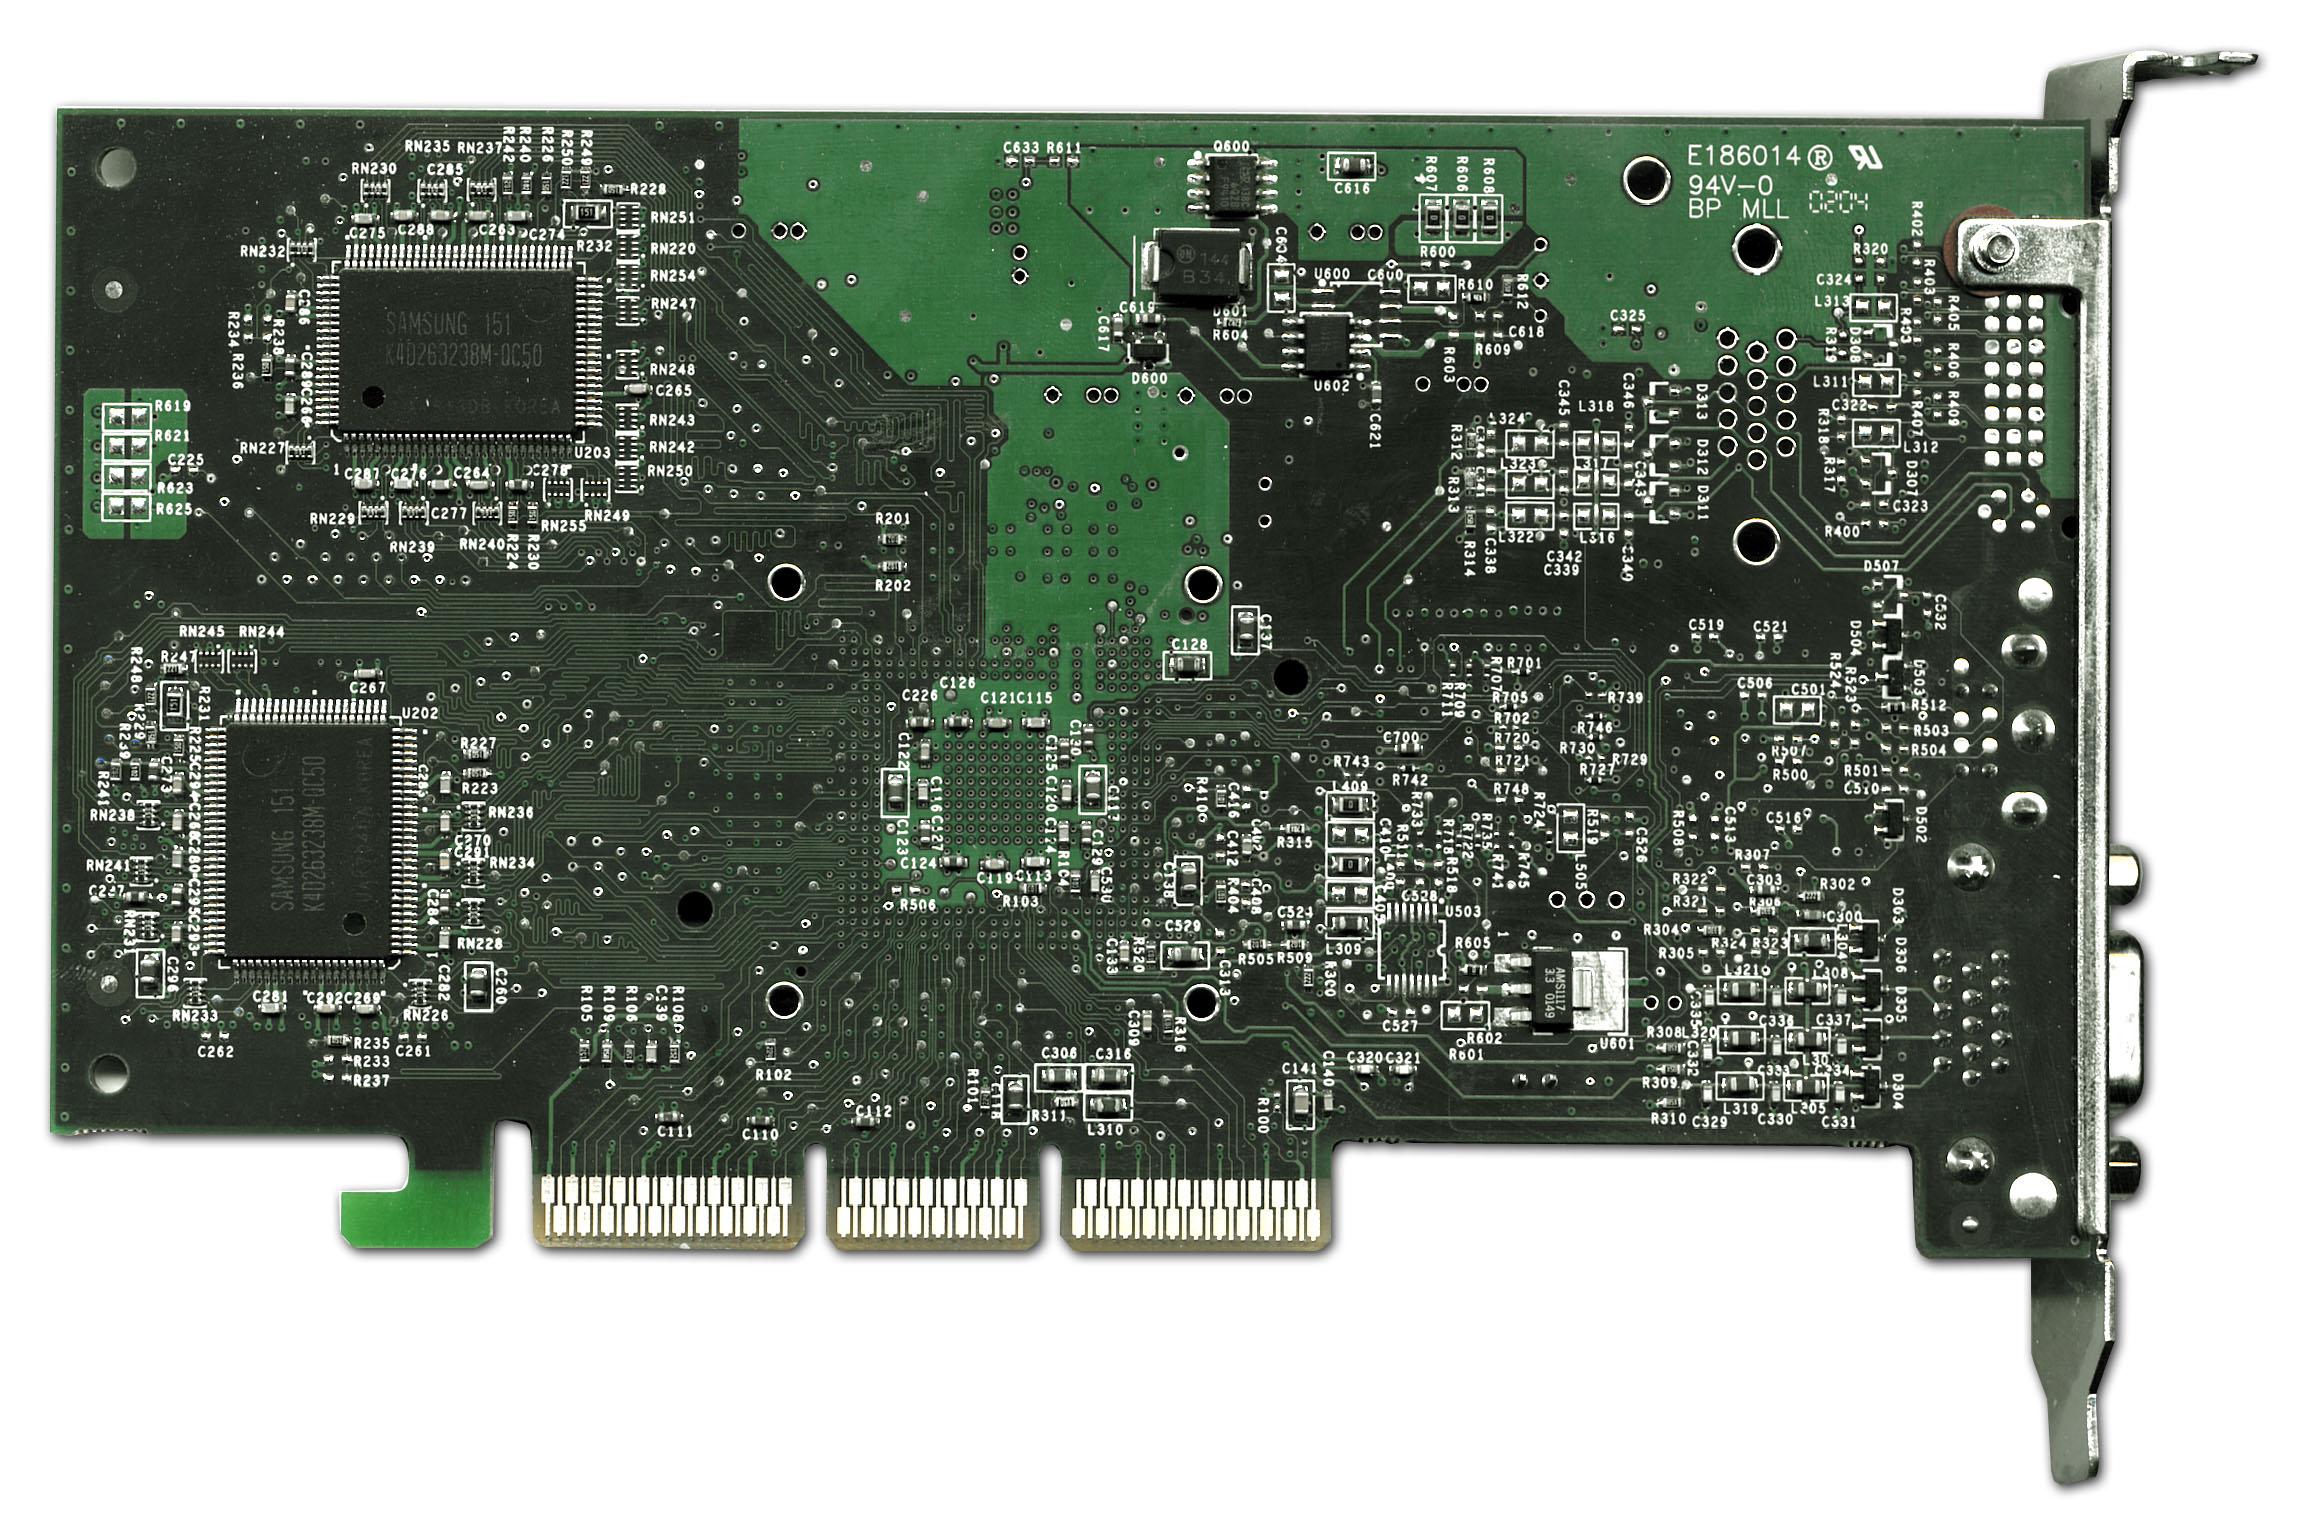 Geforce4 Ti 4200 With Agp8x Driver